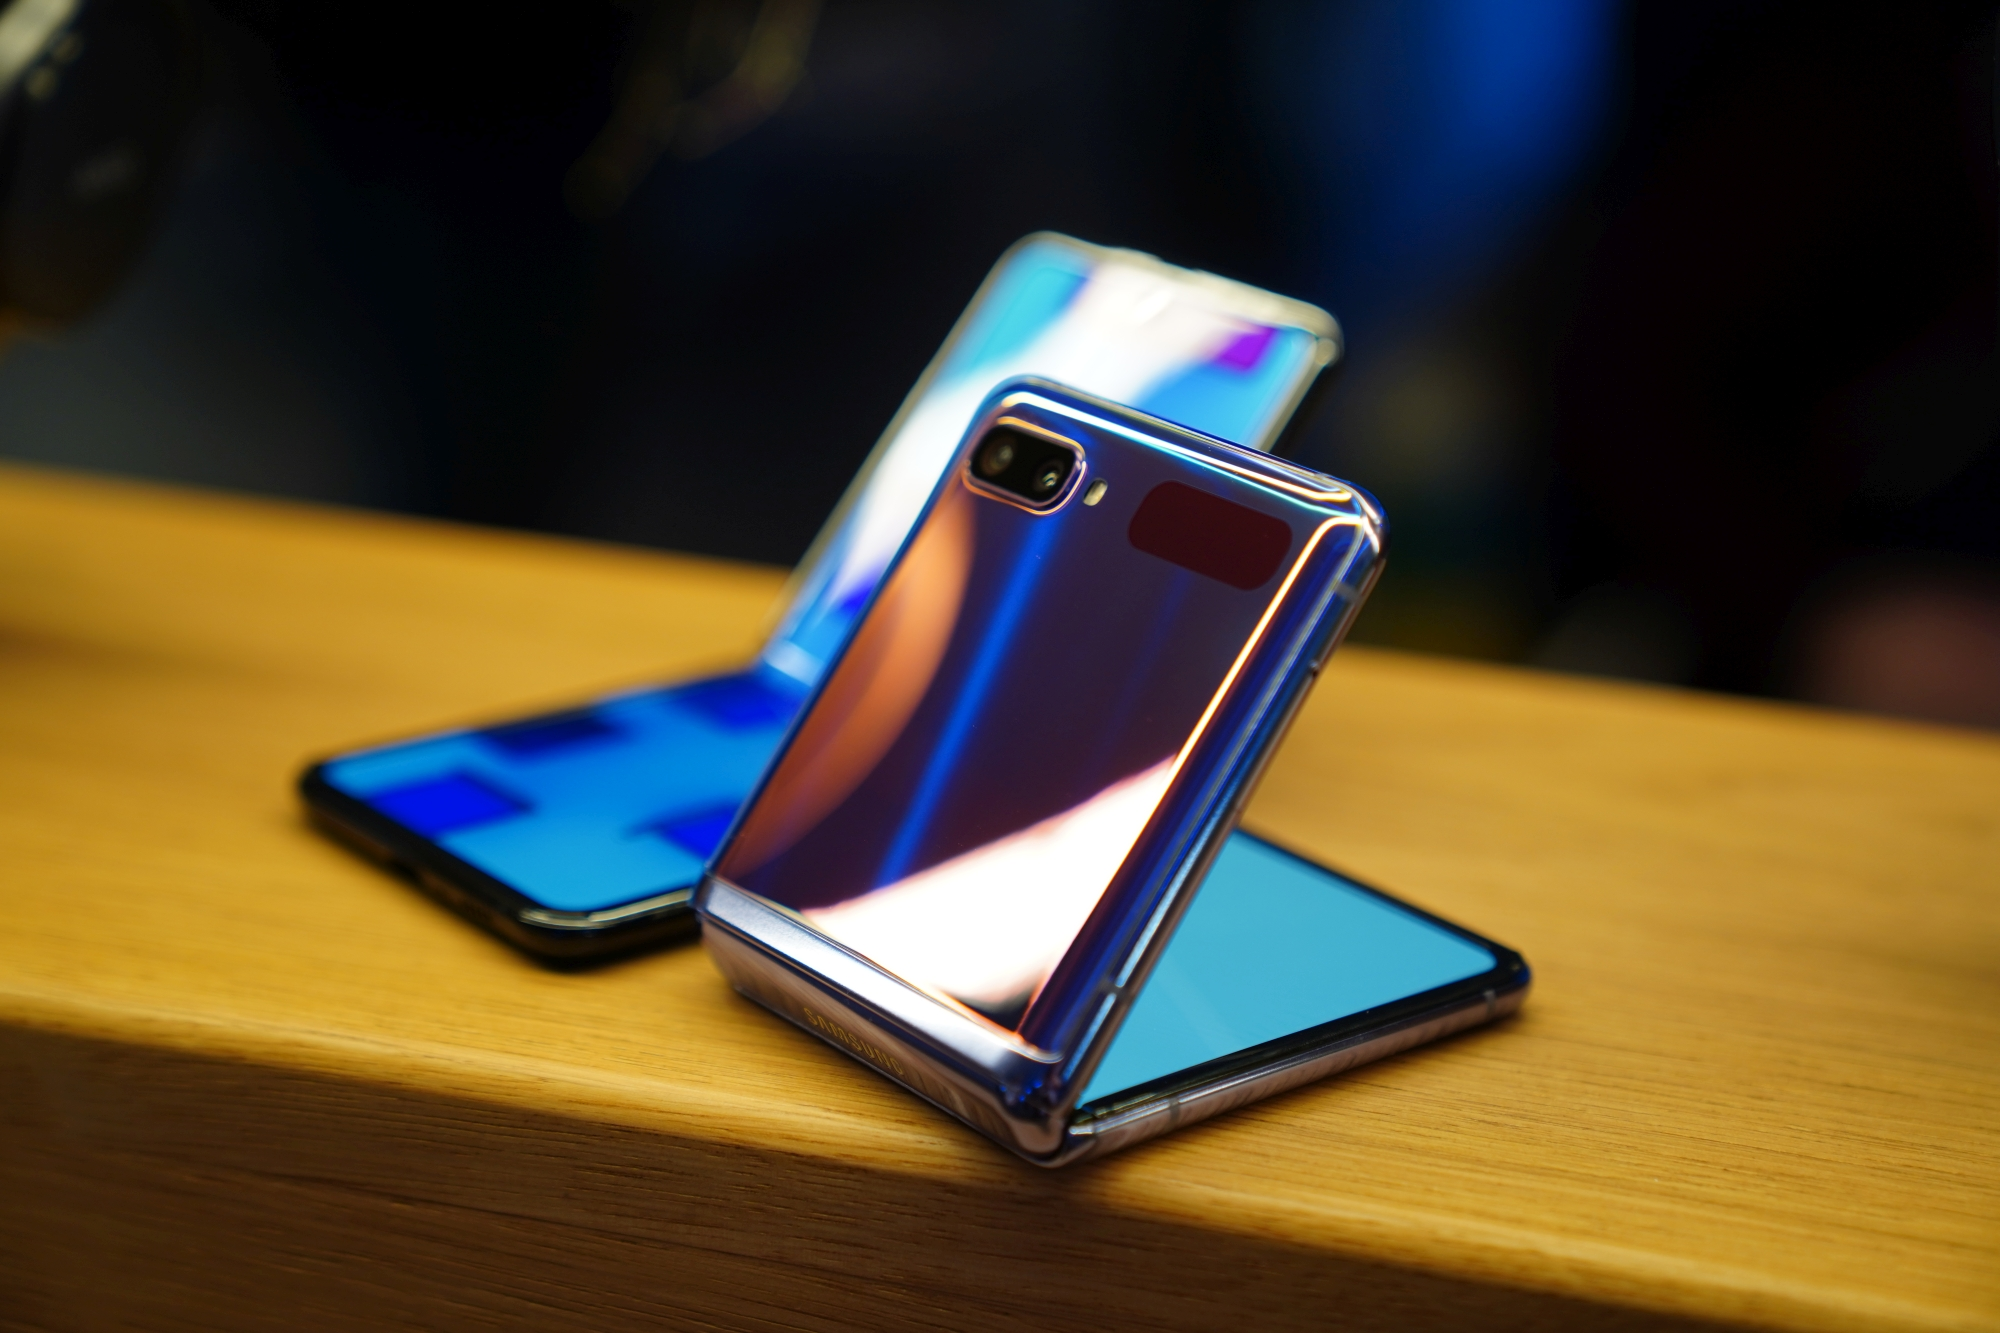 składane smartfony Samsung Galaxy Z Flip foldable smartphones